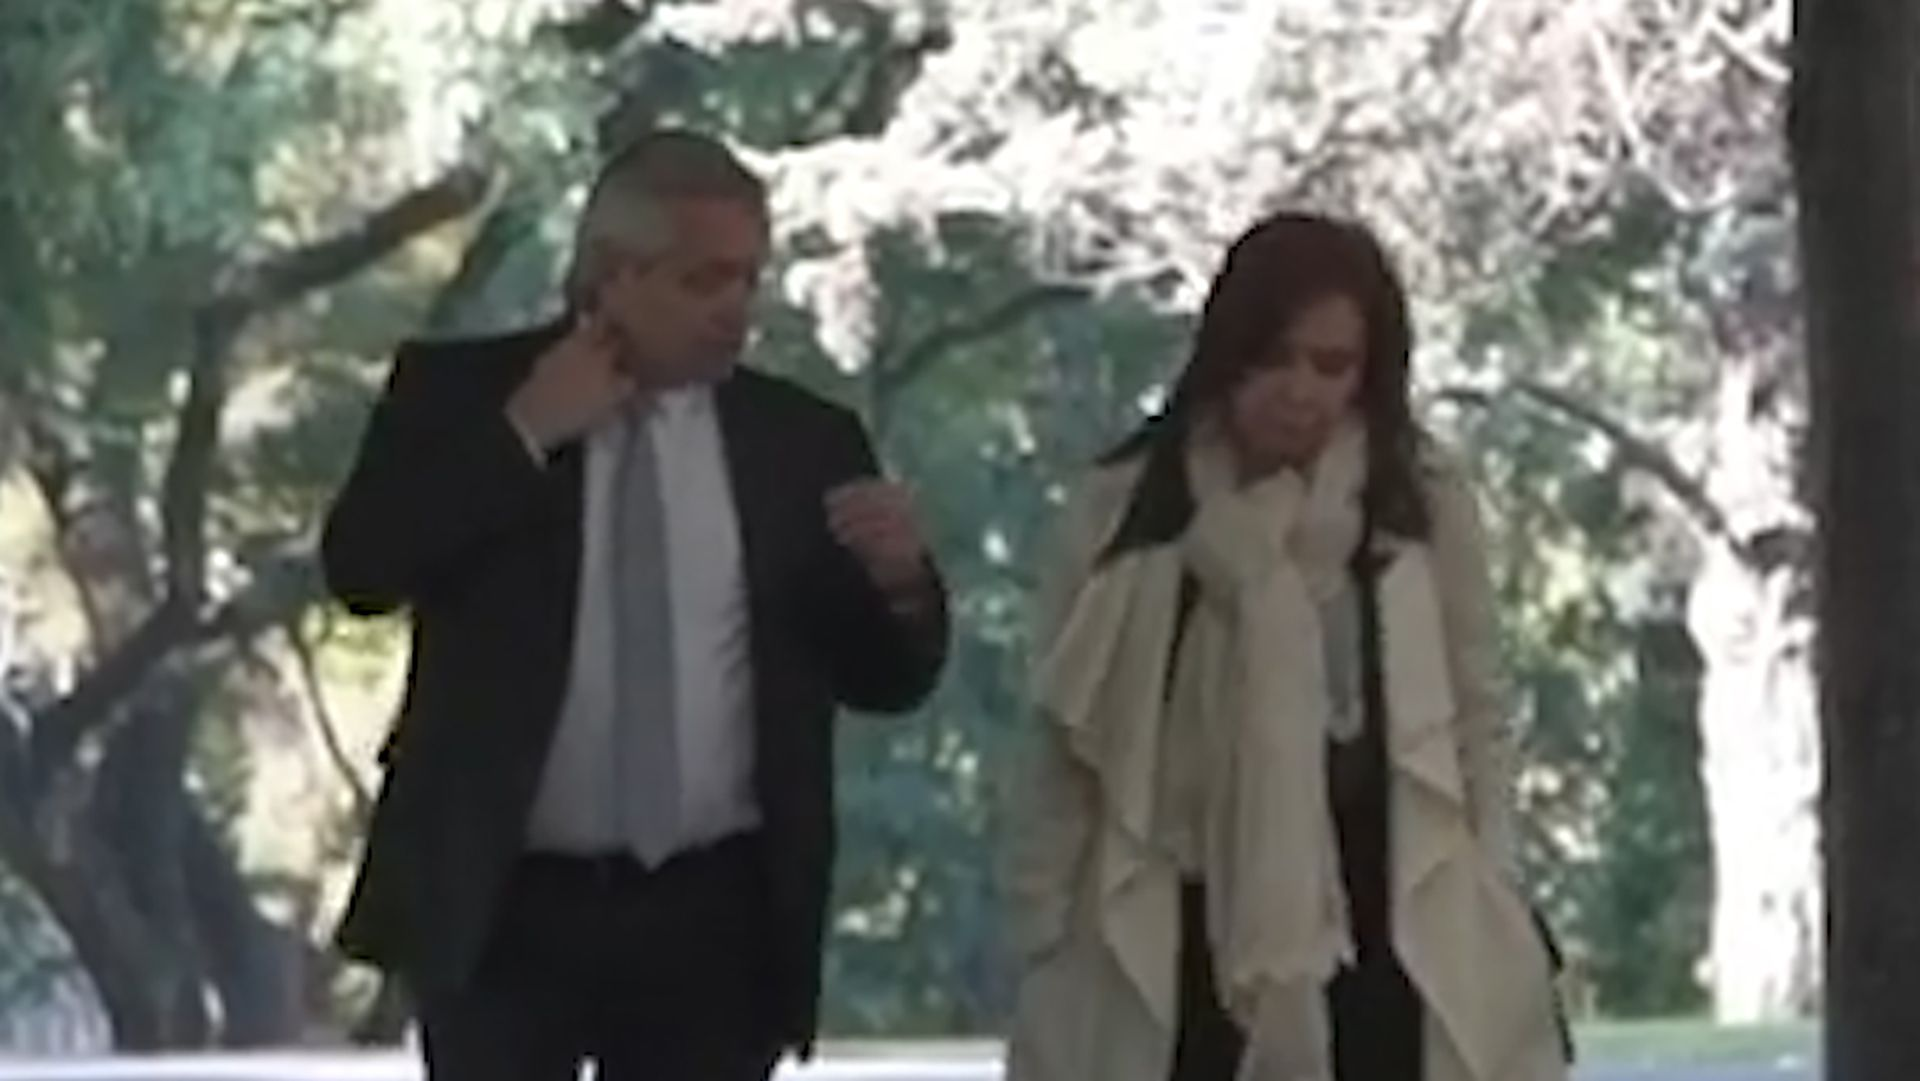 fotos del presidente alberto fernandez y cristina fernandez de kirchner